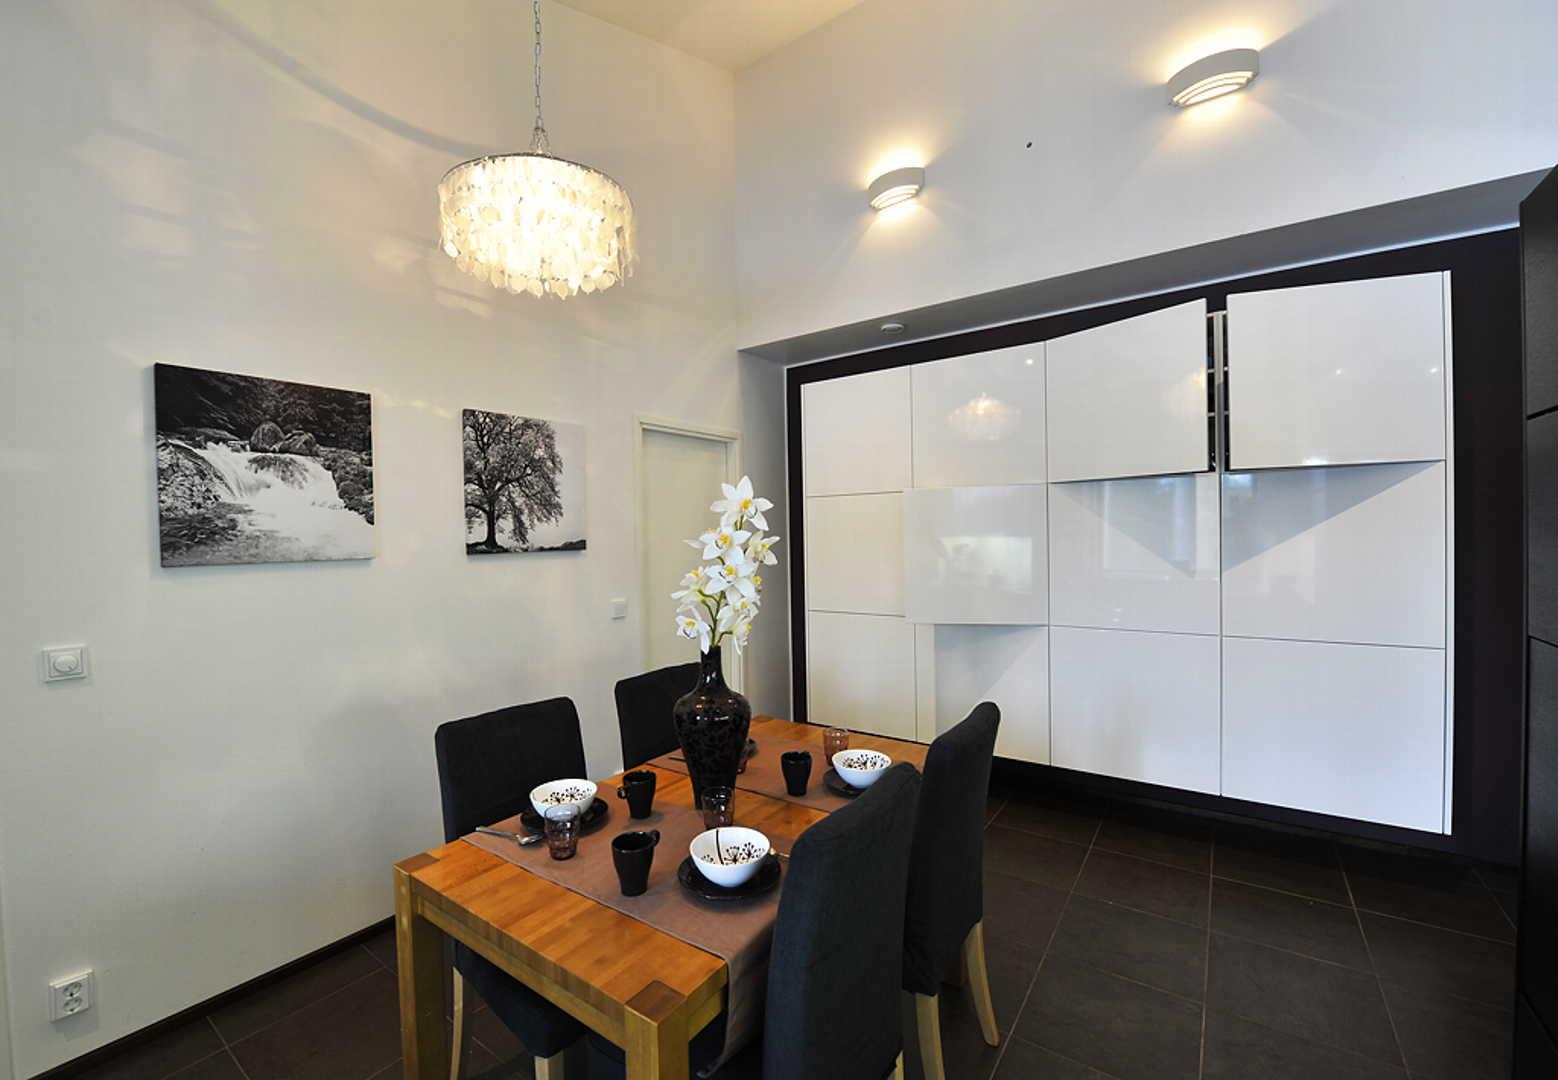 Moderni keittiö, Sisustus  keittiö, Opdeco, 524306fe498e62e699879822  Etuov